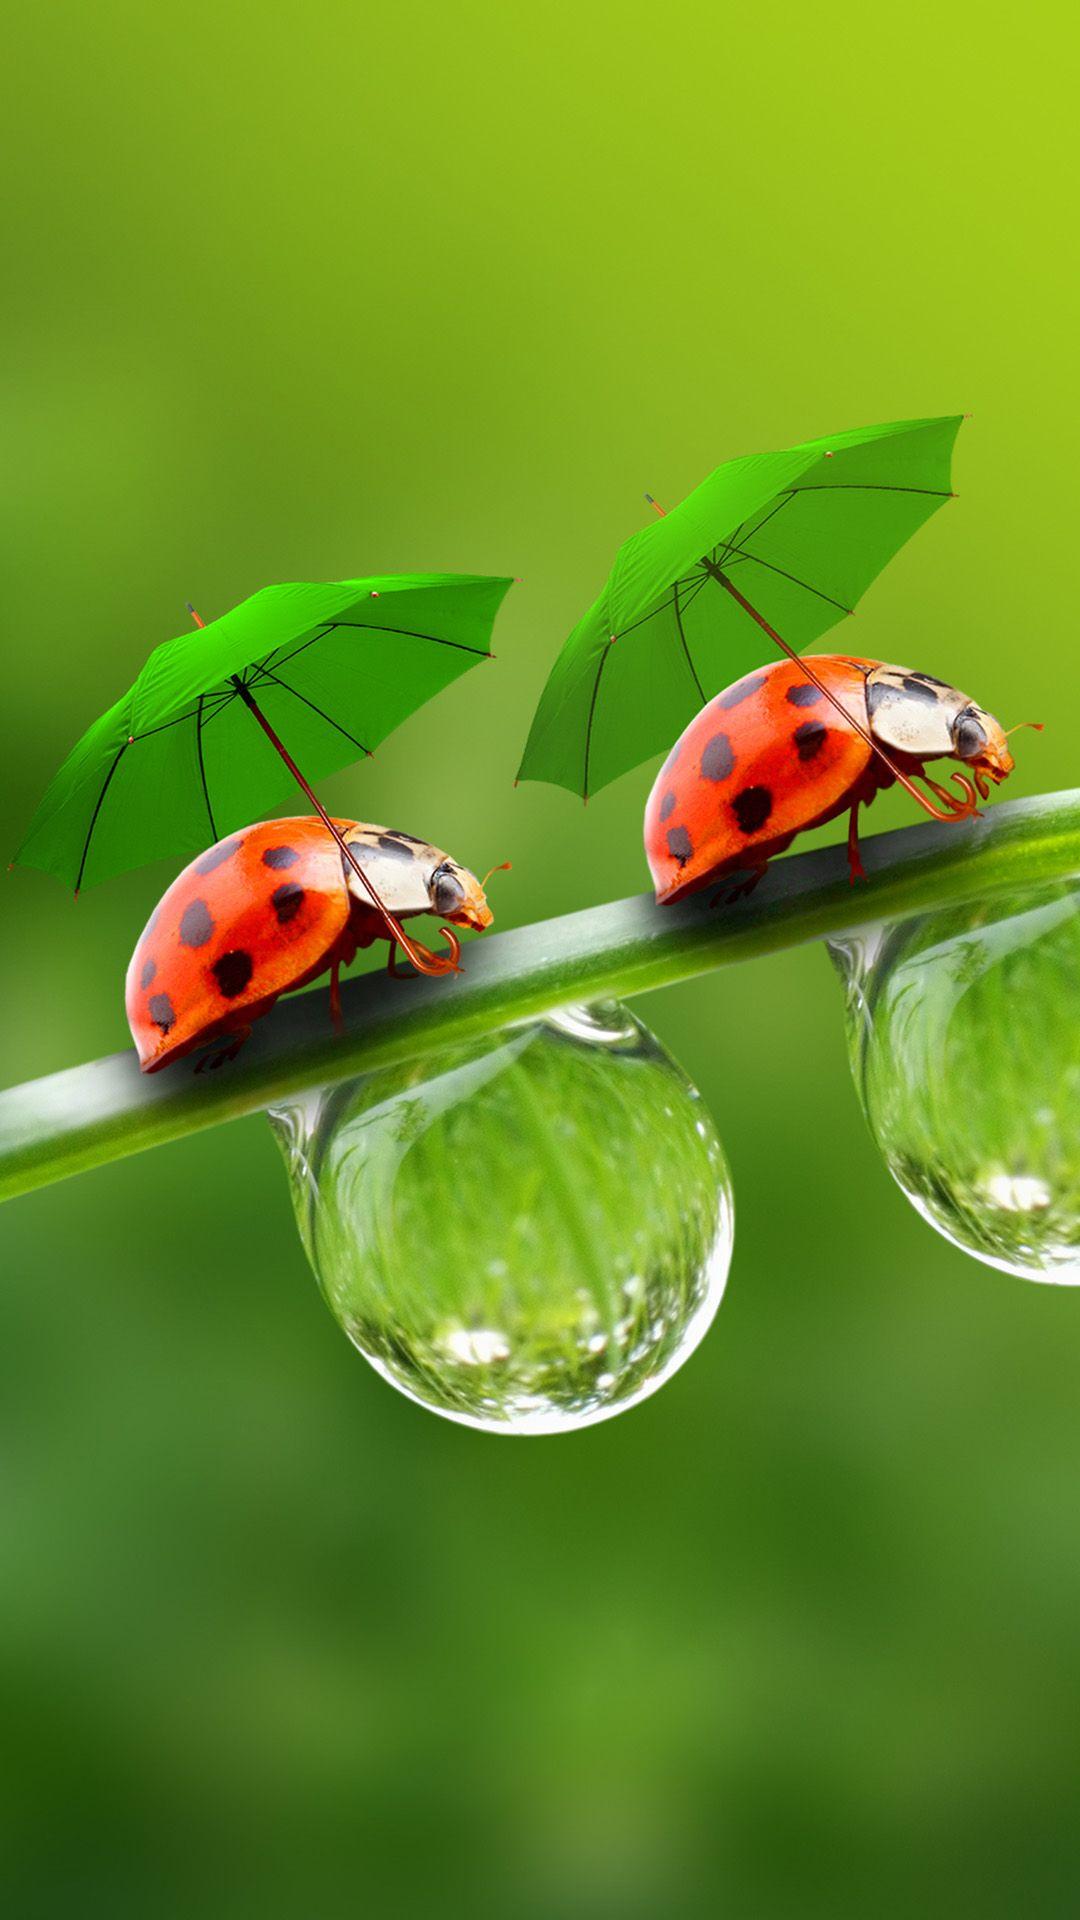 Nature Beetle In Umbrella On Dew Leaf iPhone 6 plus